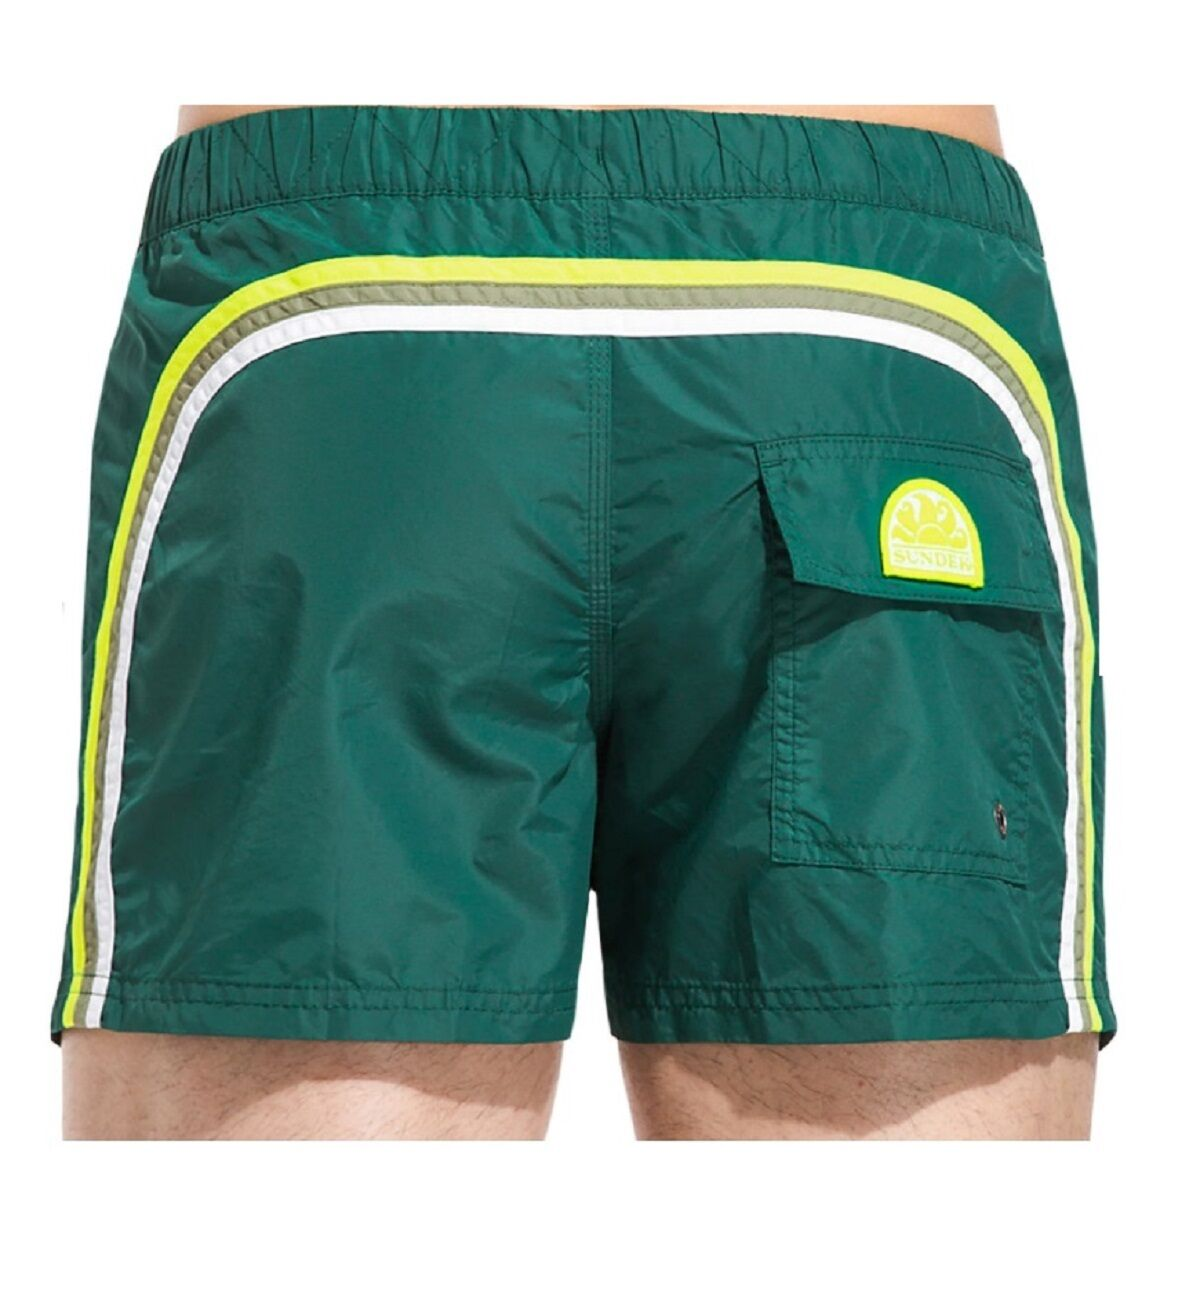 Costume Sundek m520bdta100 457 elastic waist 13 hut green ss17